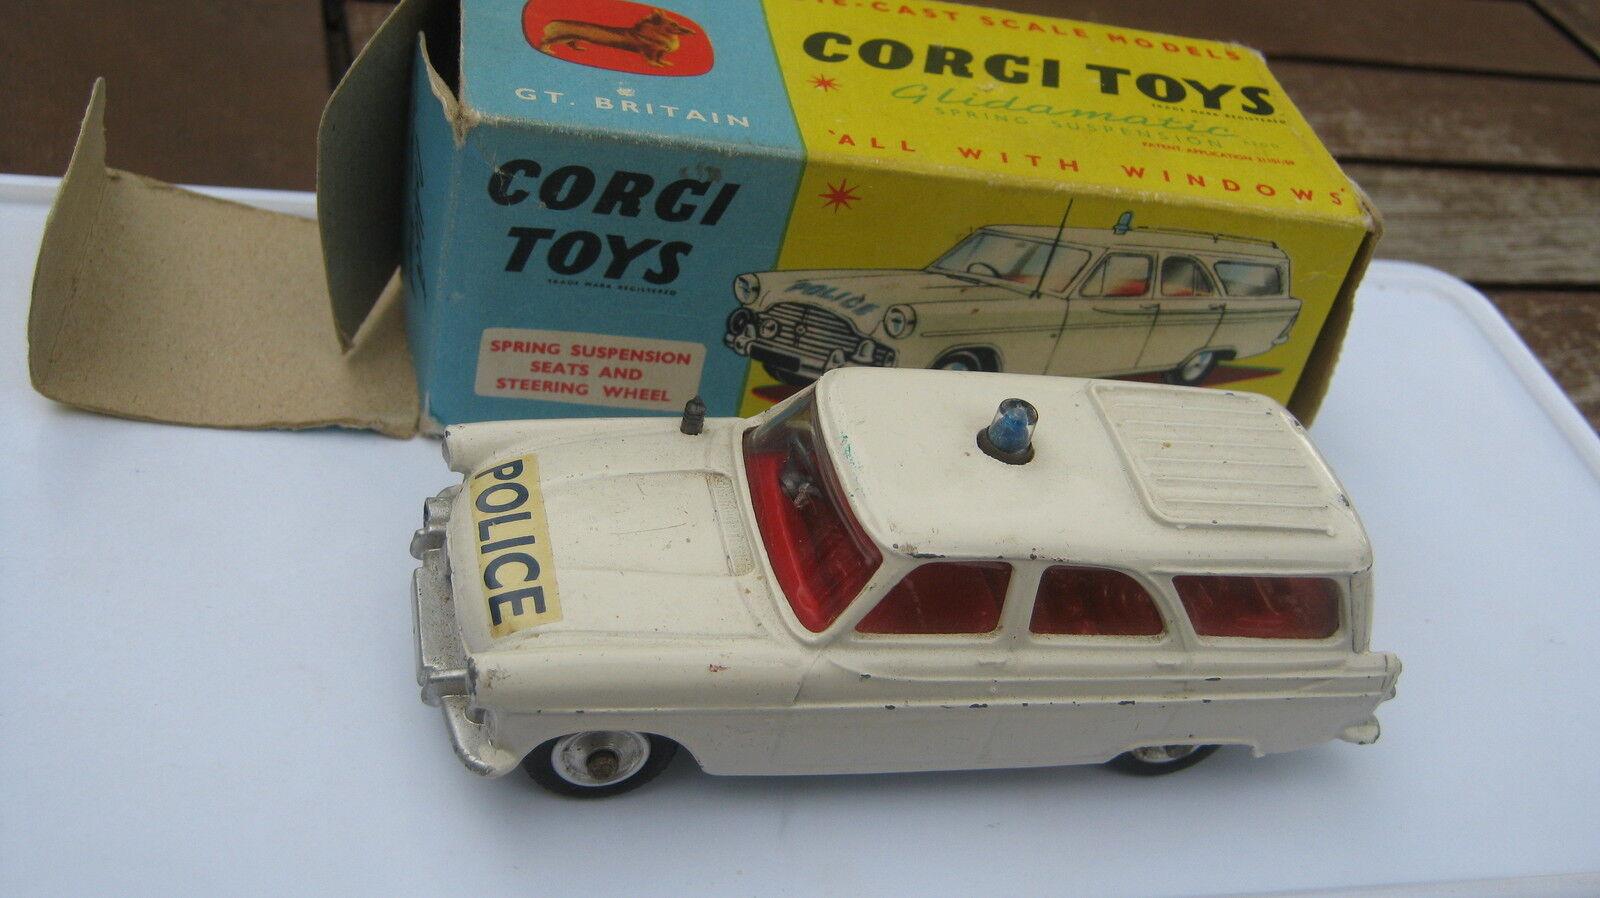 CORGI 419 FORD POLICE ZEPHYR ZEPHYR ZEPHYR GOOD ORIGINAL IN GOOD ORIGINAL BOX df1aa1